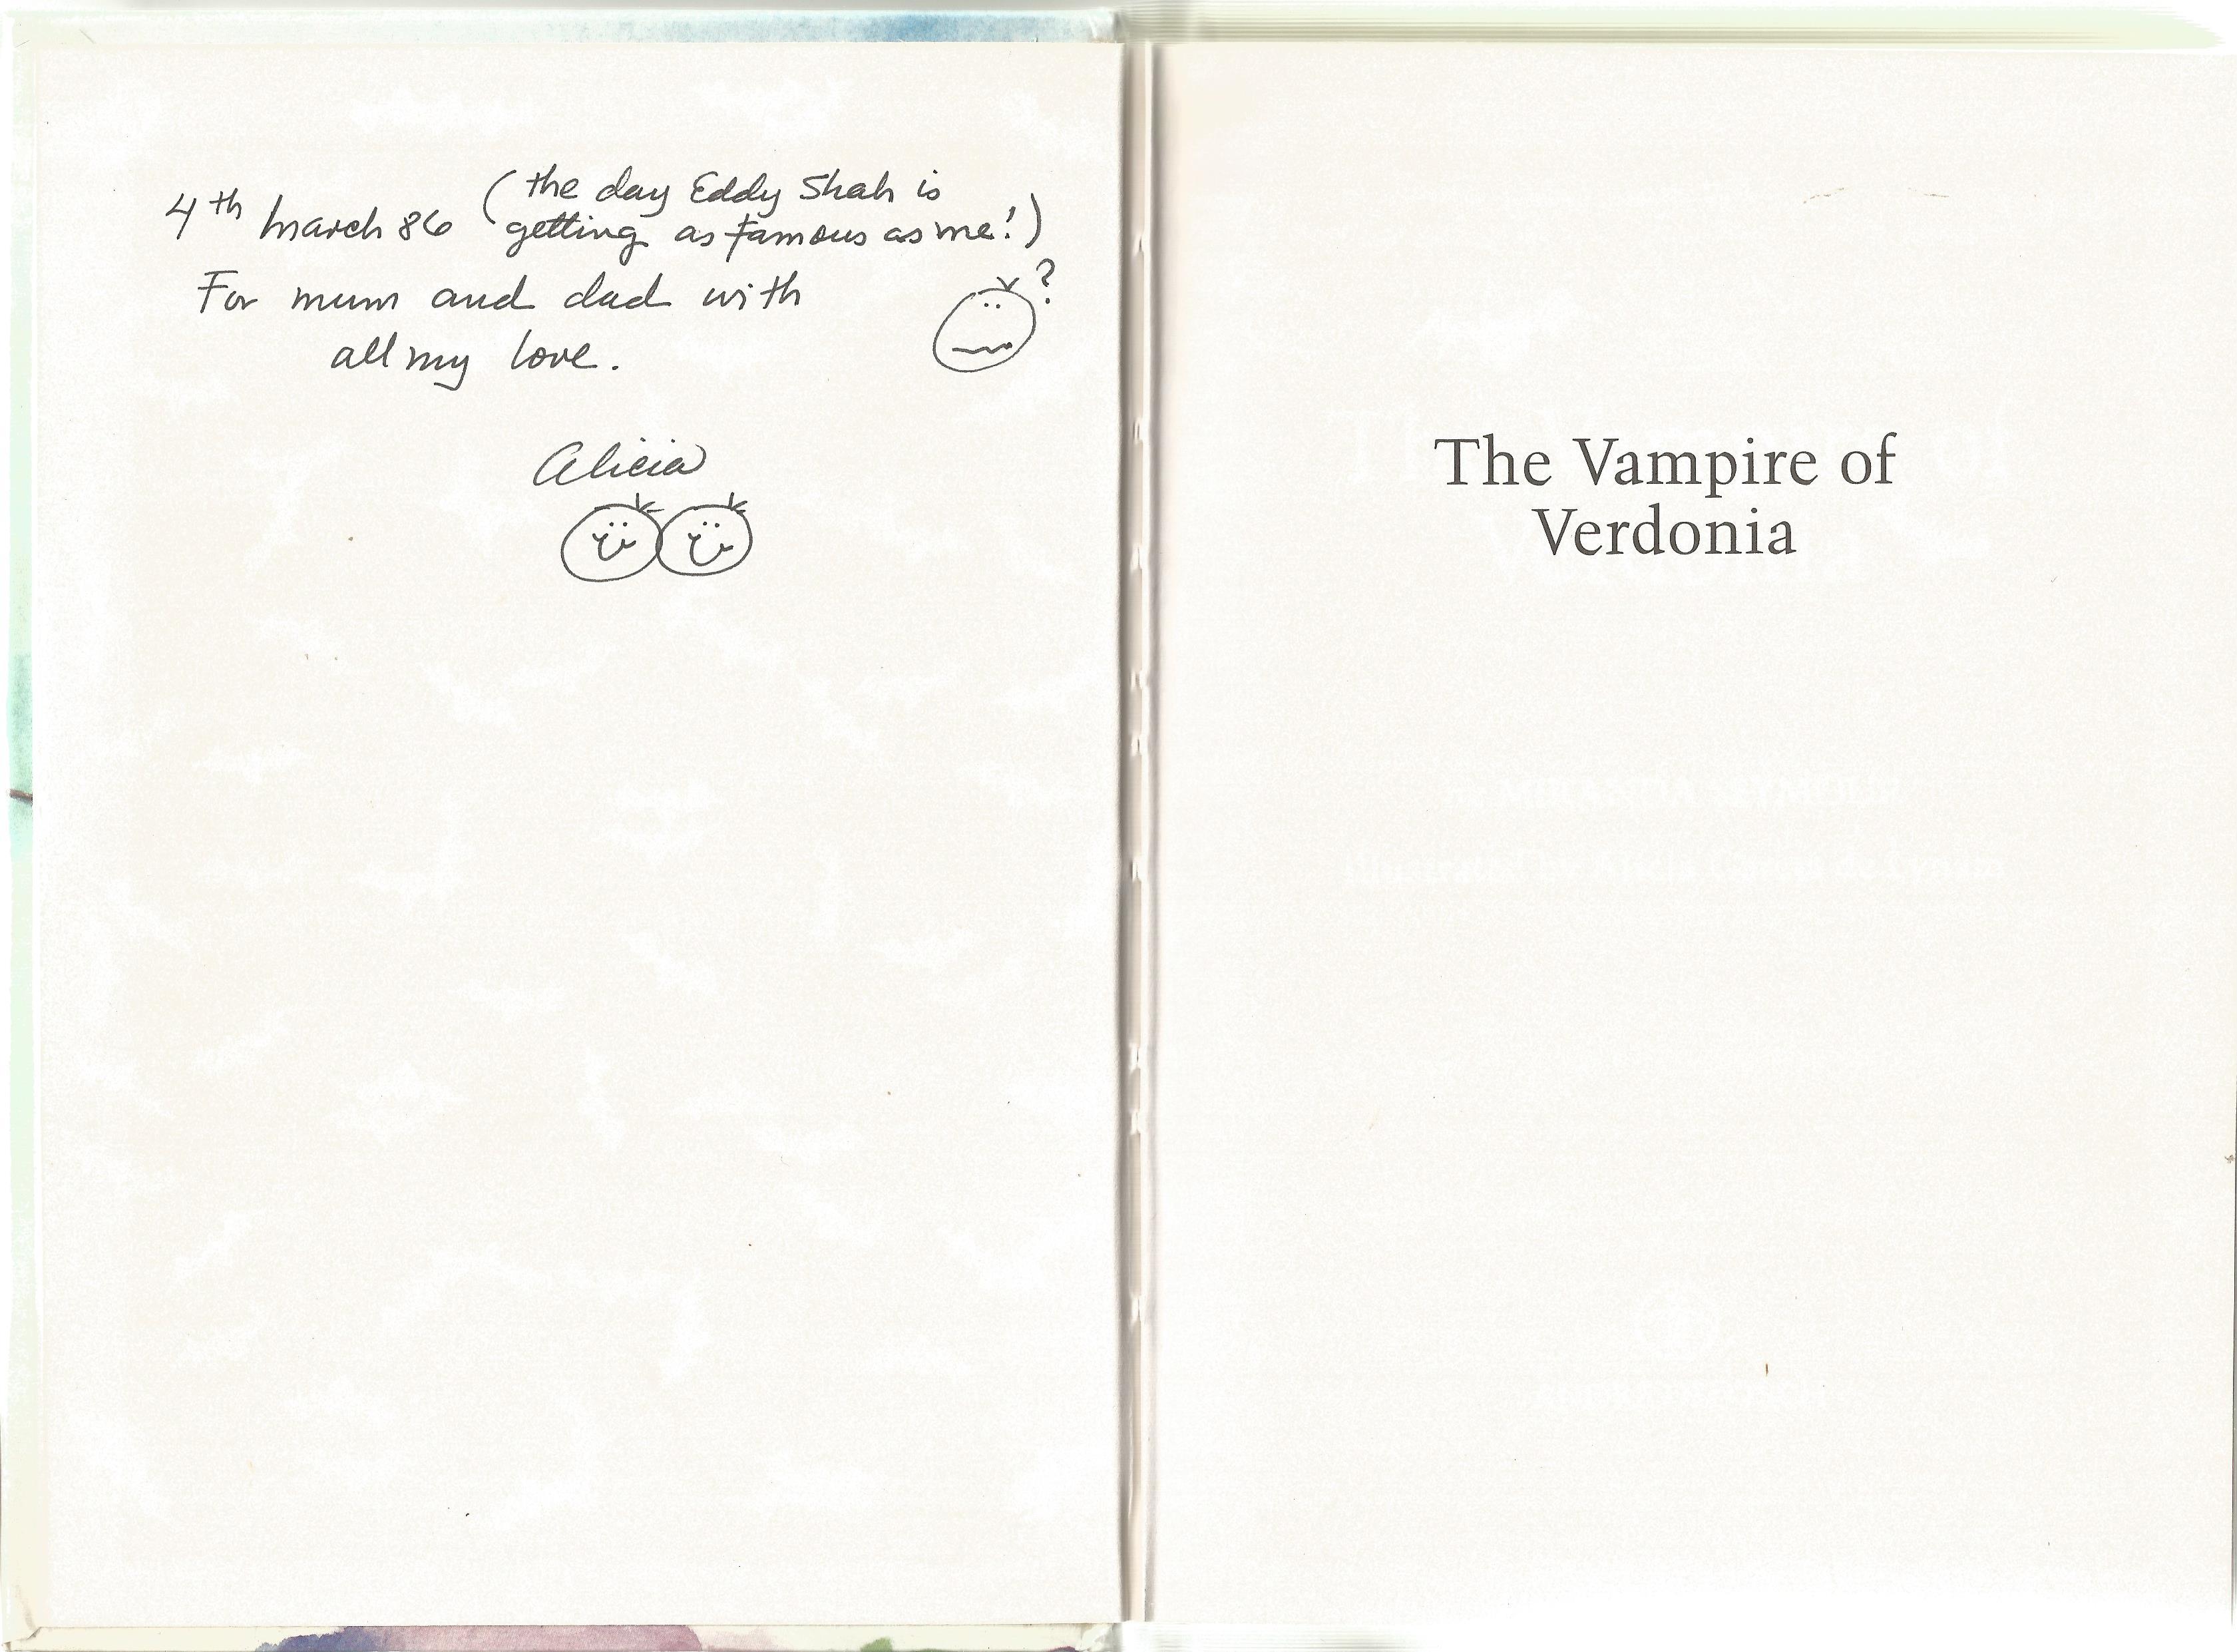 Miranda Seymour Hardback Book The Vampire of Verdonia signed by the Illustrator Alicia Garcia de - Image 2 of 2